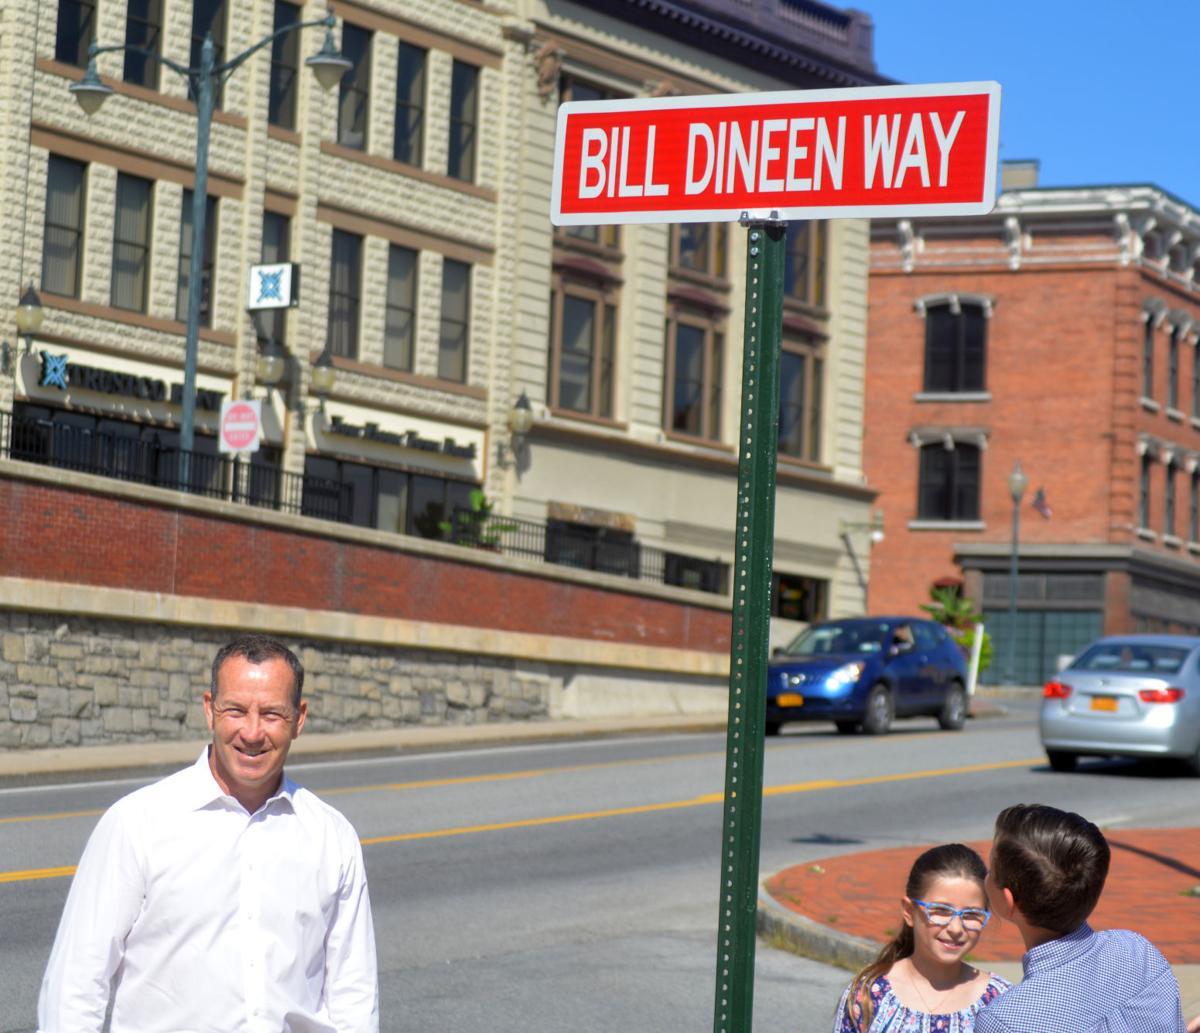 Bill Dineen Way